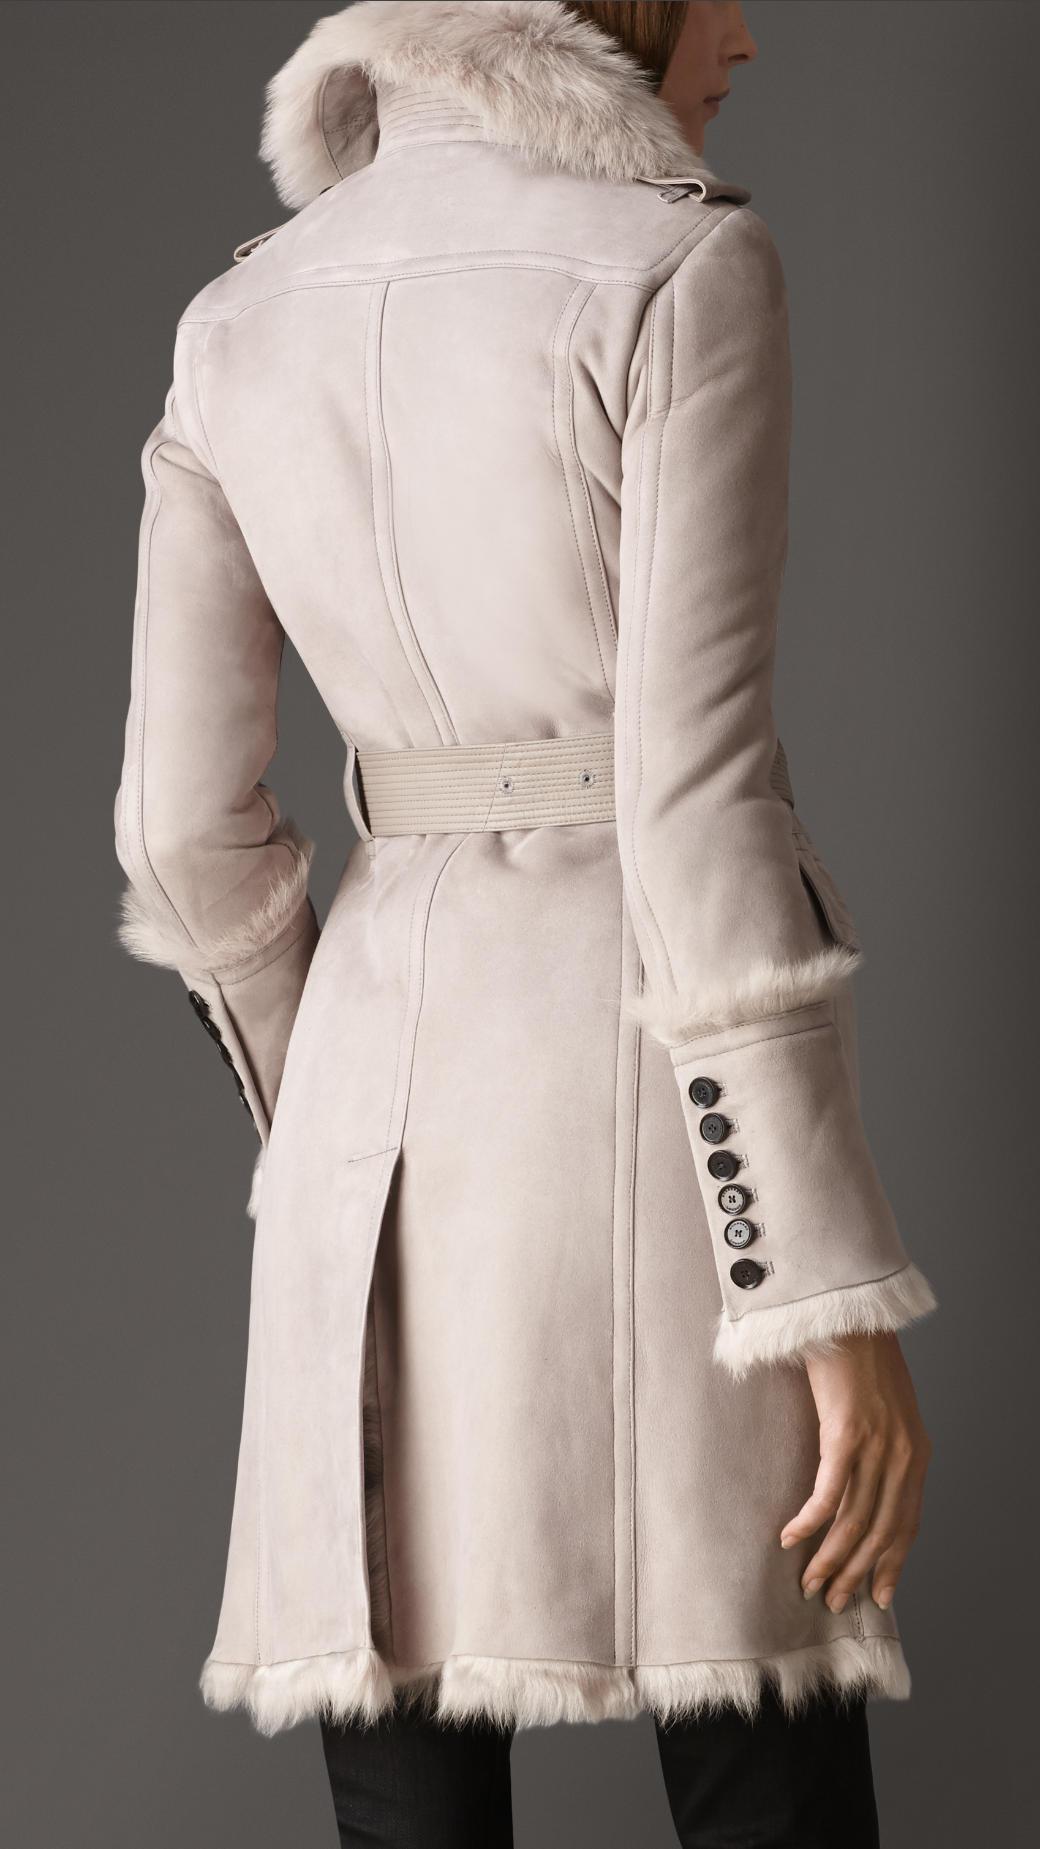 Burberry Revere Collar Lambskin Shearling Coat in Black | Lyst